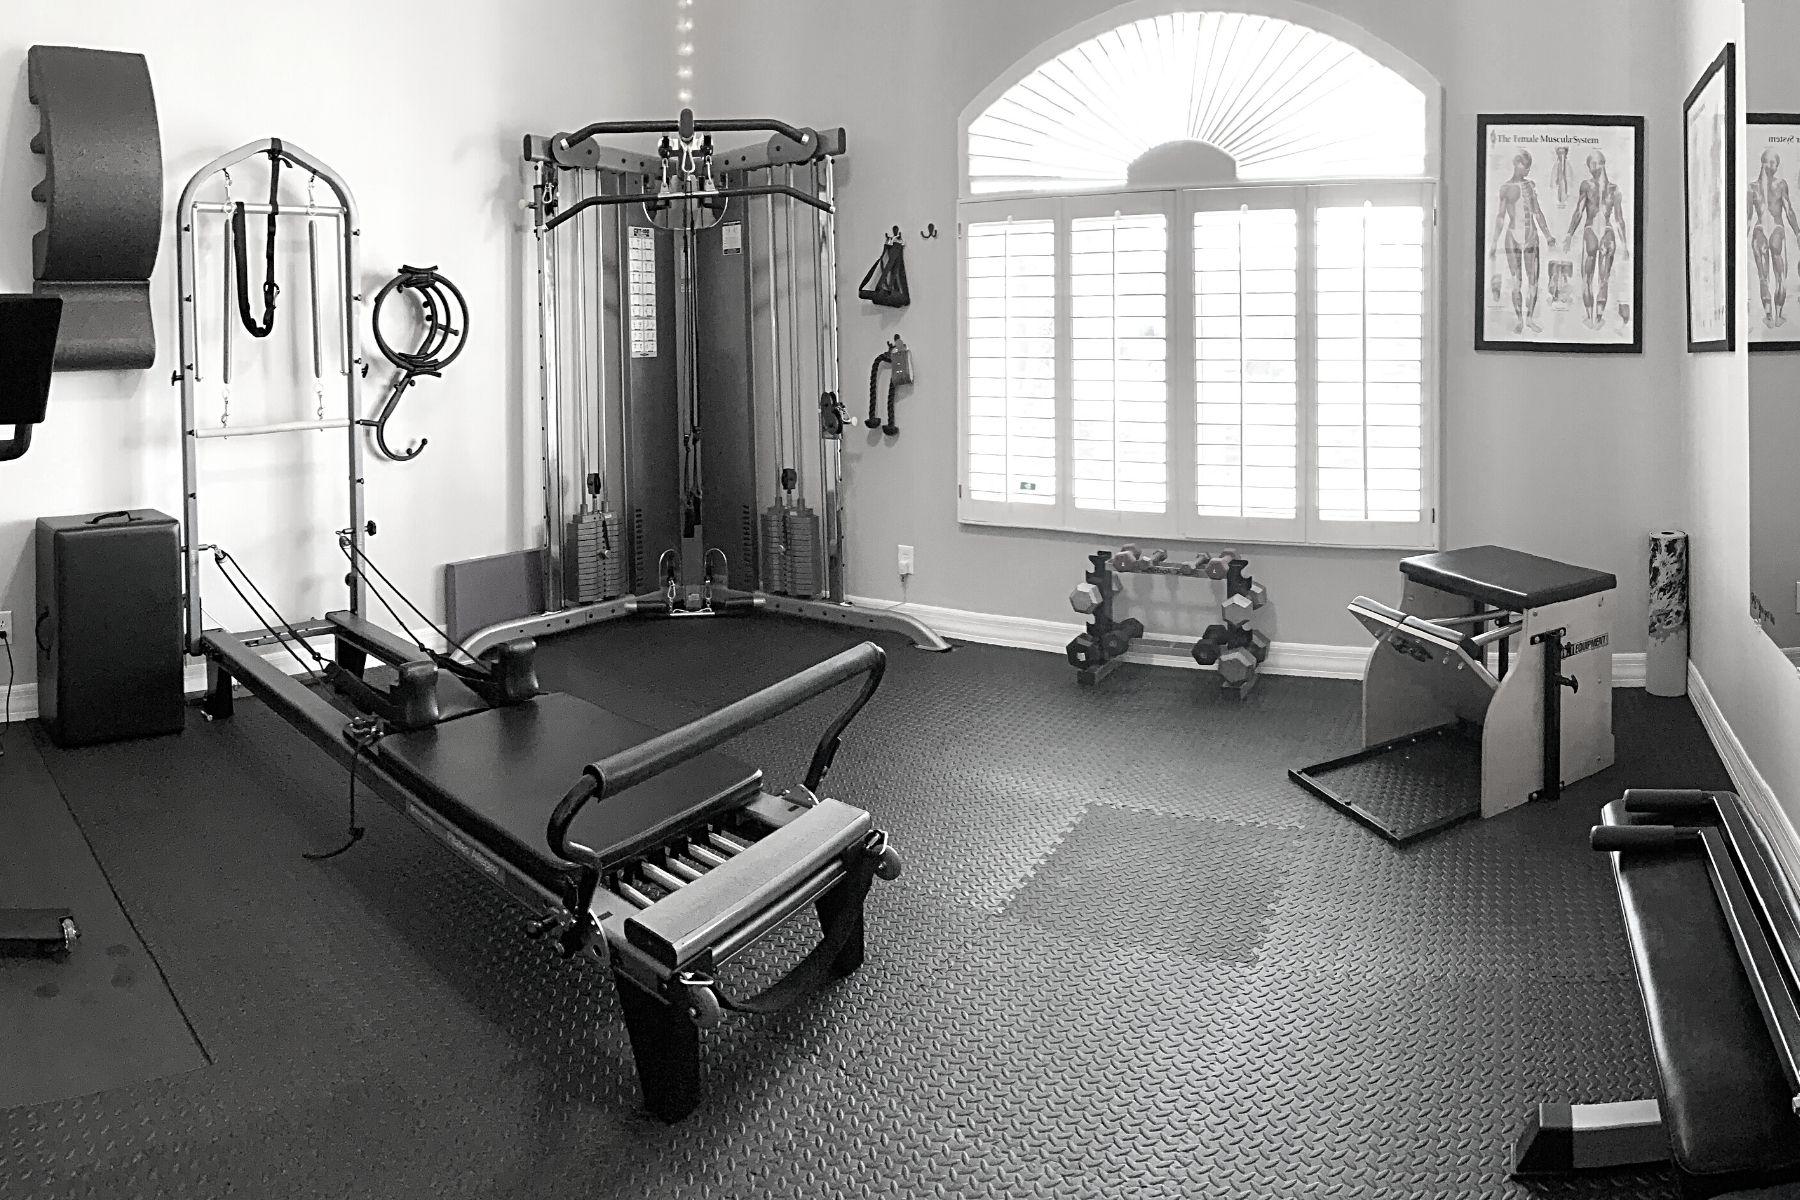 Private Pilates Training Mesa AZ